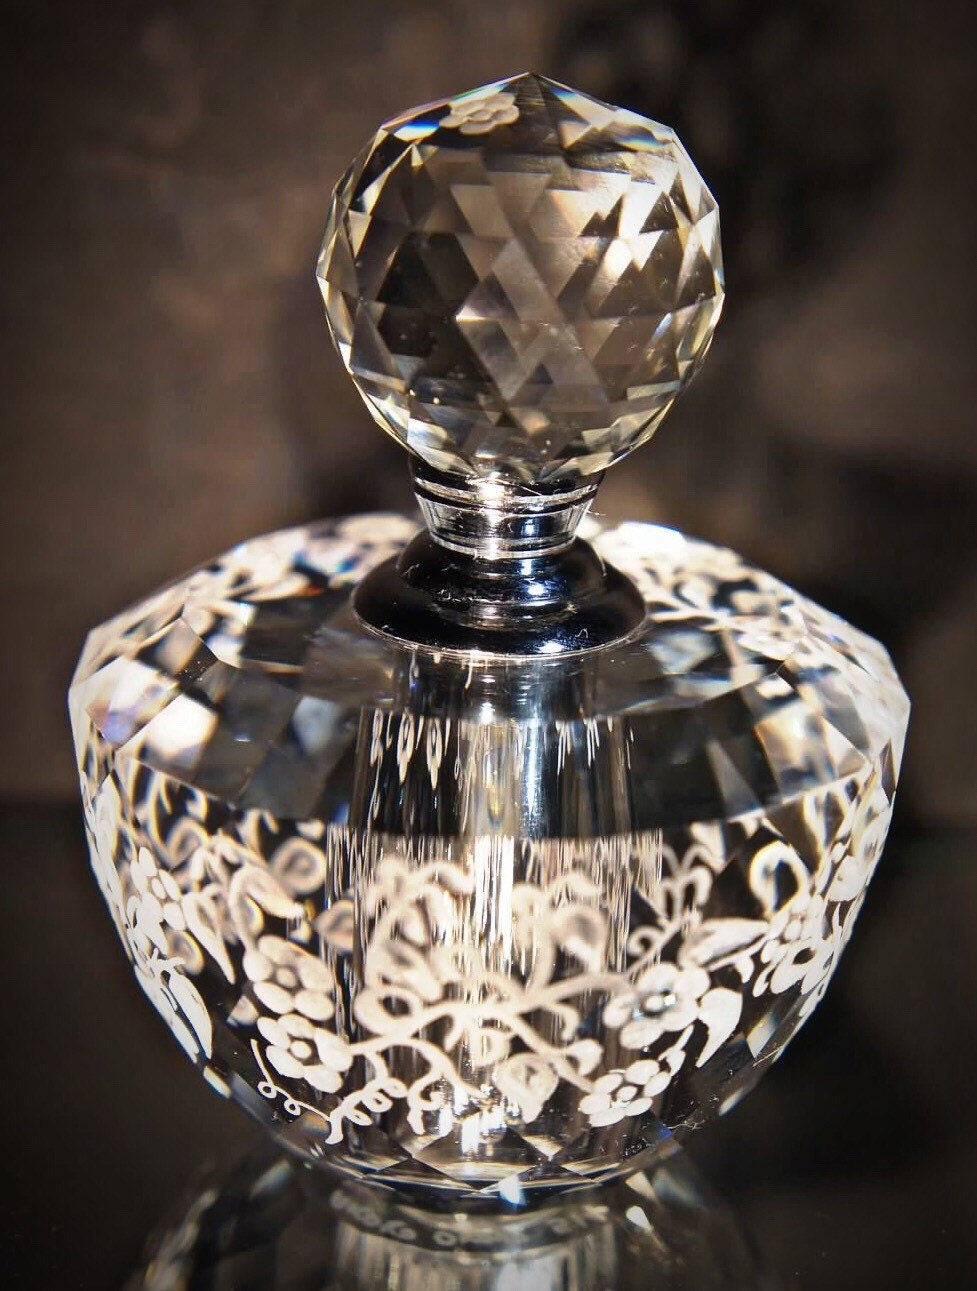 perfume geb dresser lux mirror tray importhubviewitem bella crystal vanity rhinestone bathroom